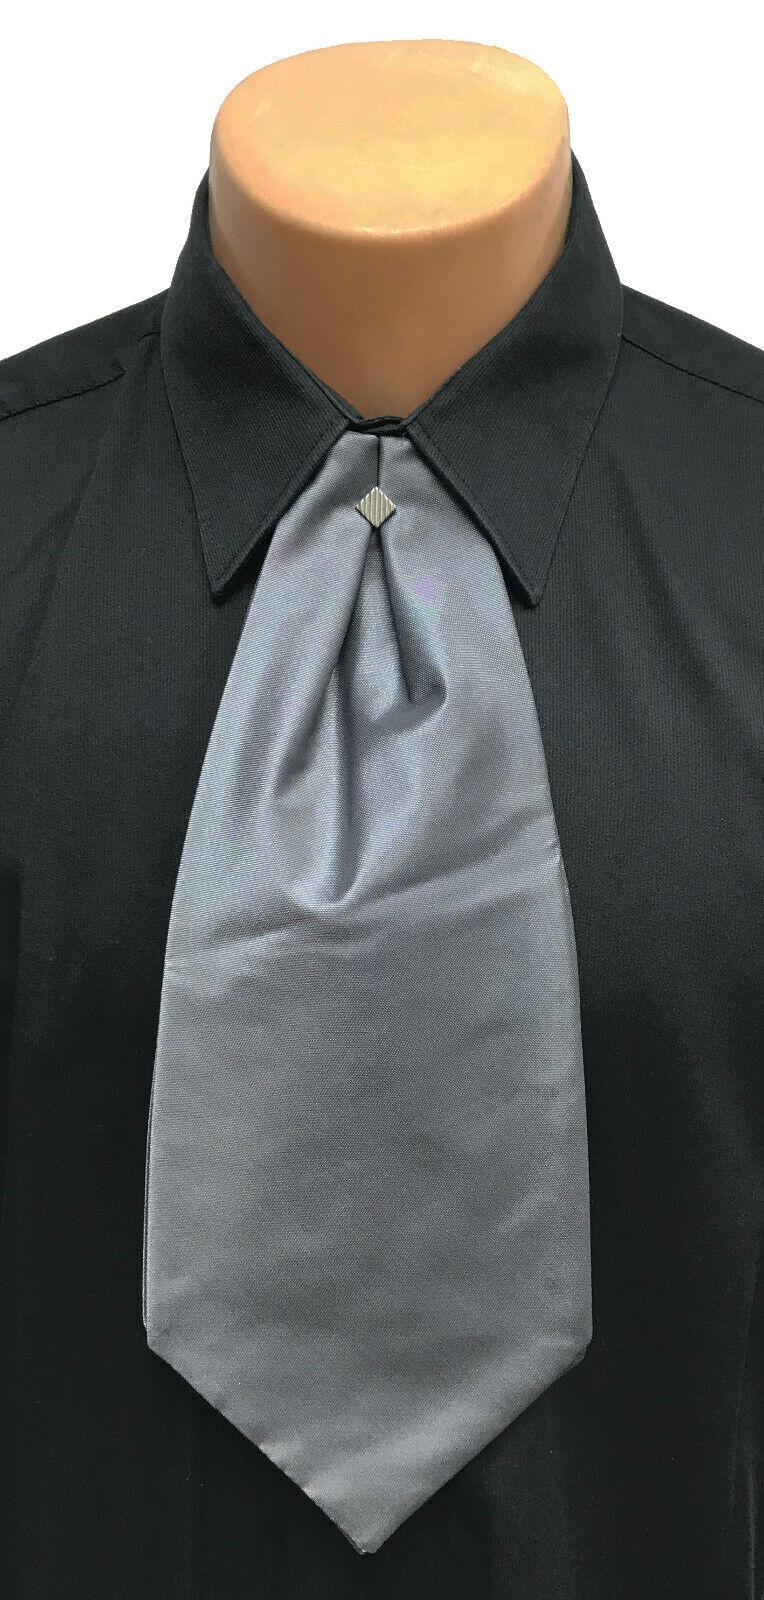 Grey Dark Silver Cravat with Tie Pin Pre-Tied Ascot Necktie Victorian Costume